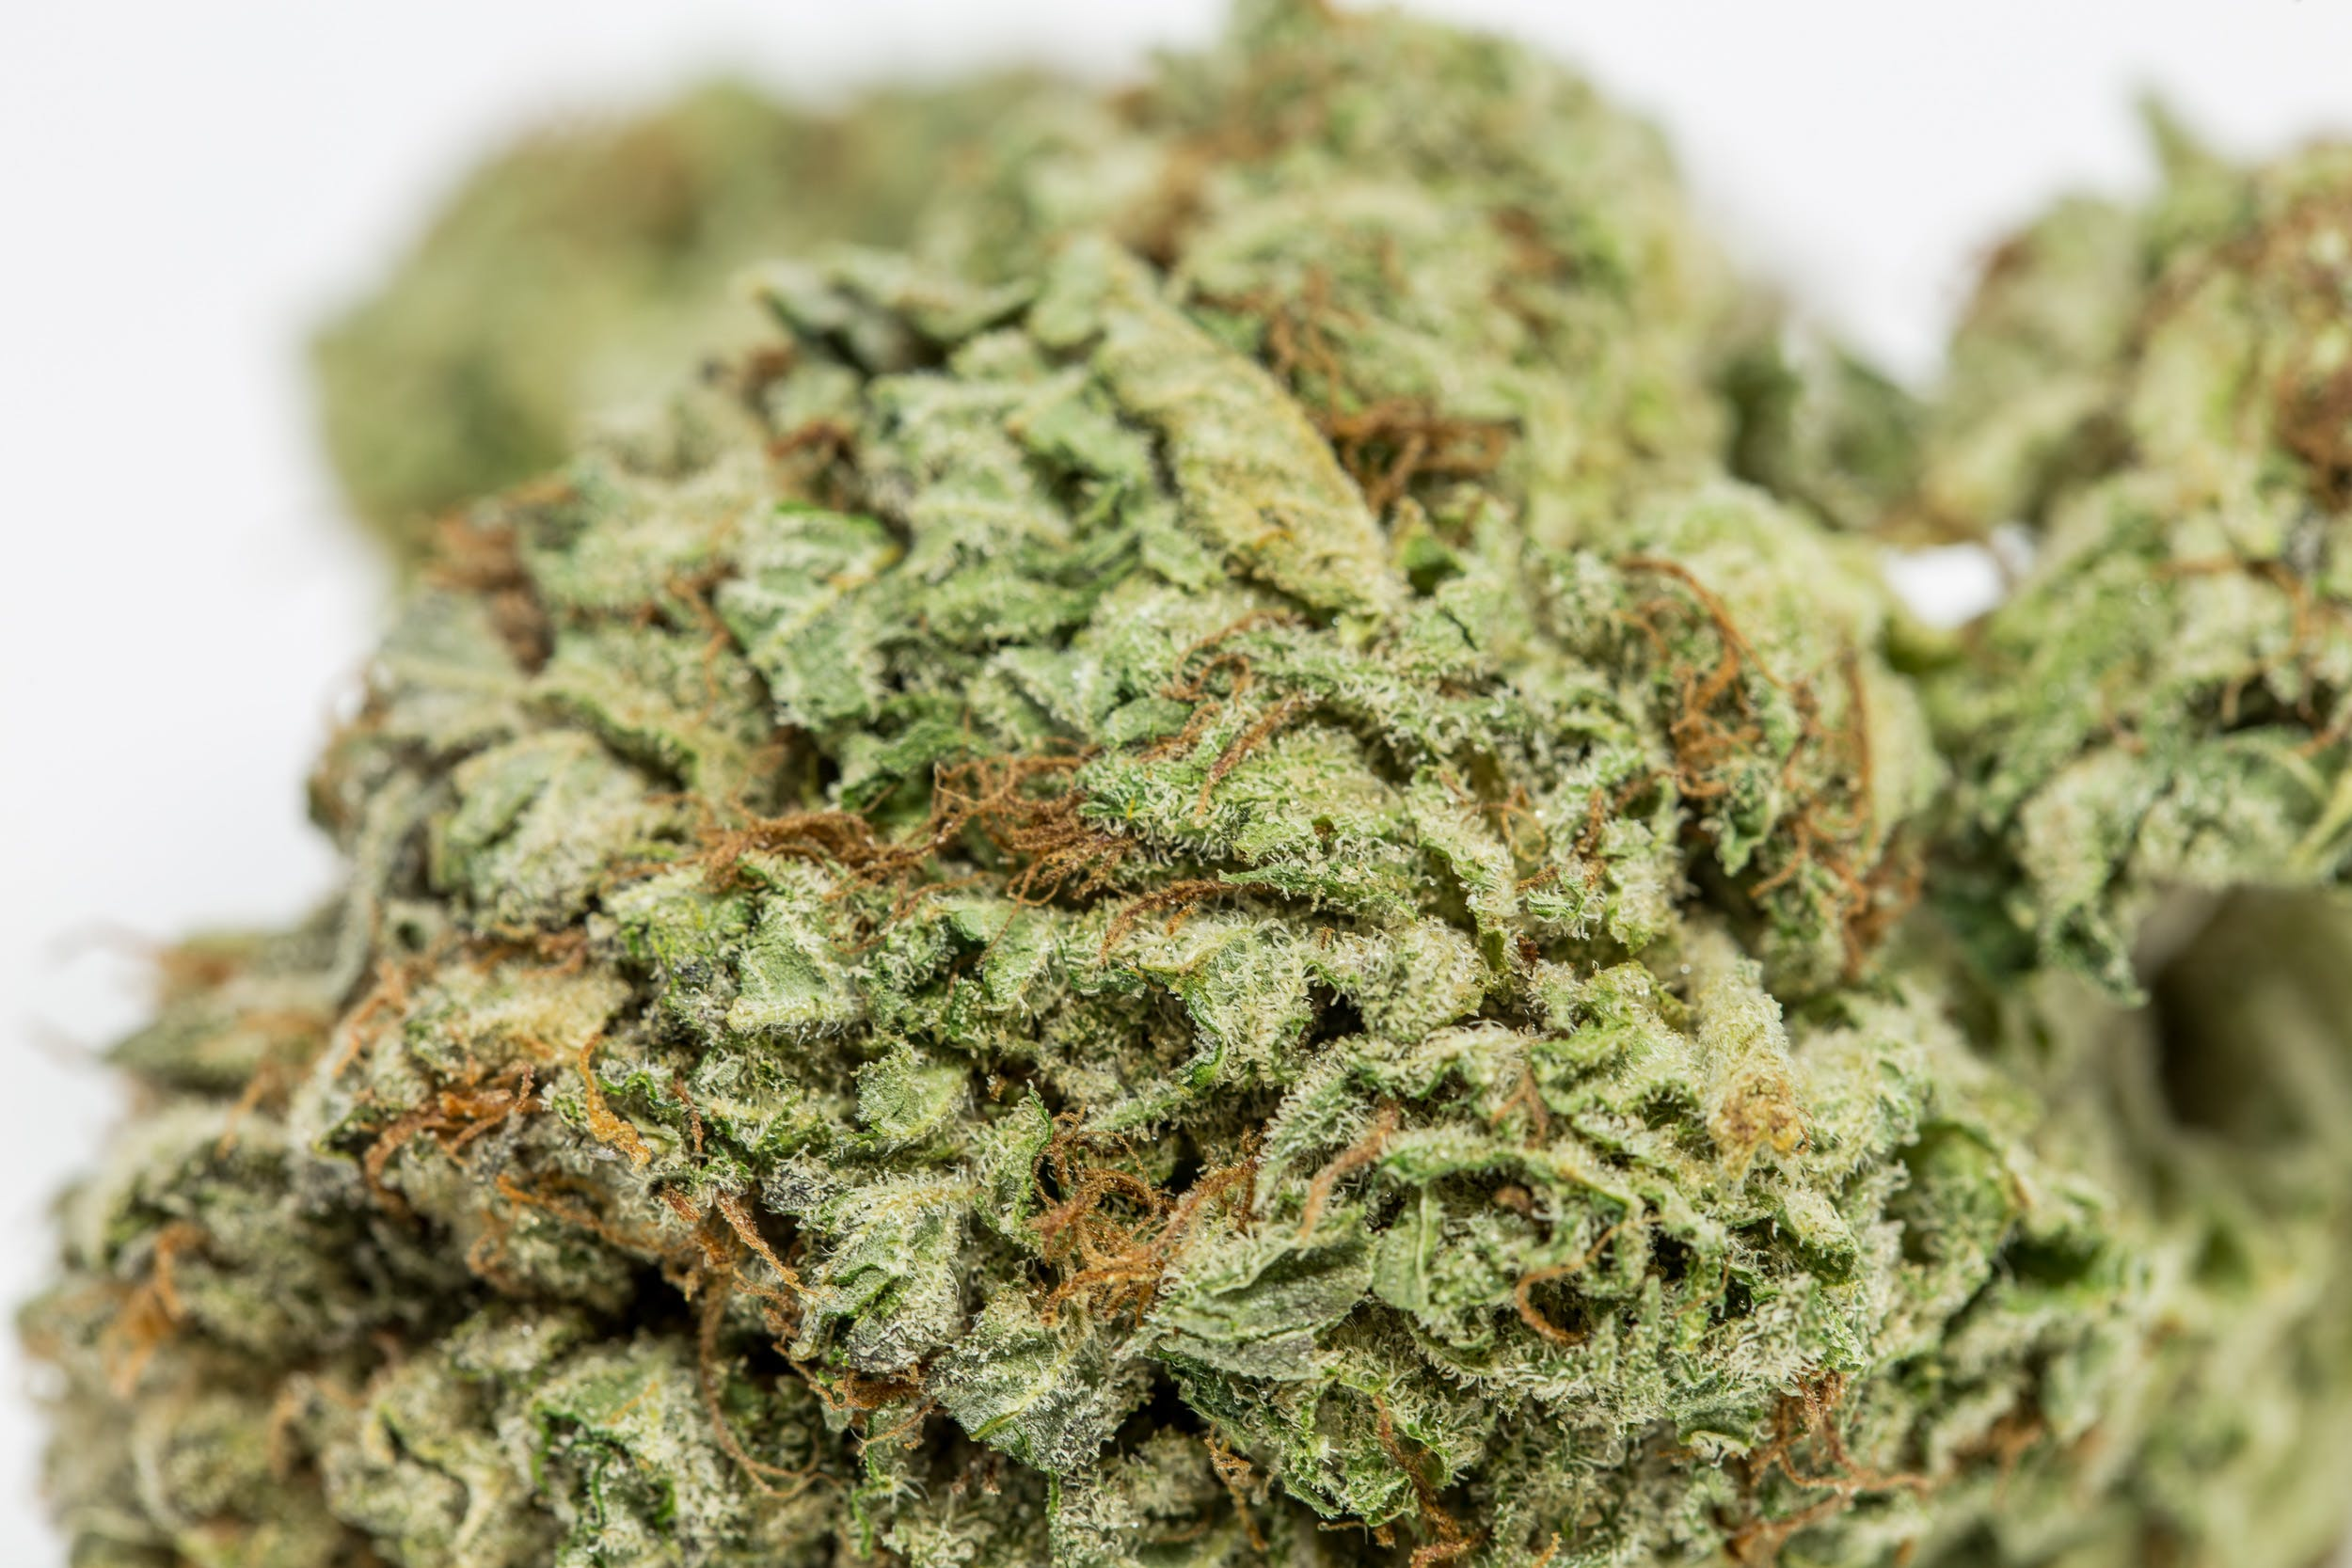 Jedi Kush Weed; Jedi Kush Cannabis Strain; Jedi Kush Indica Marijuana Strain